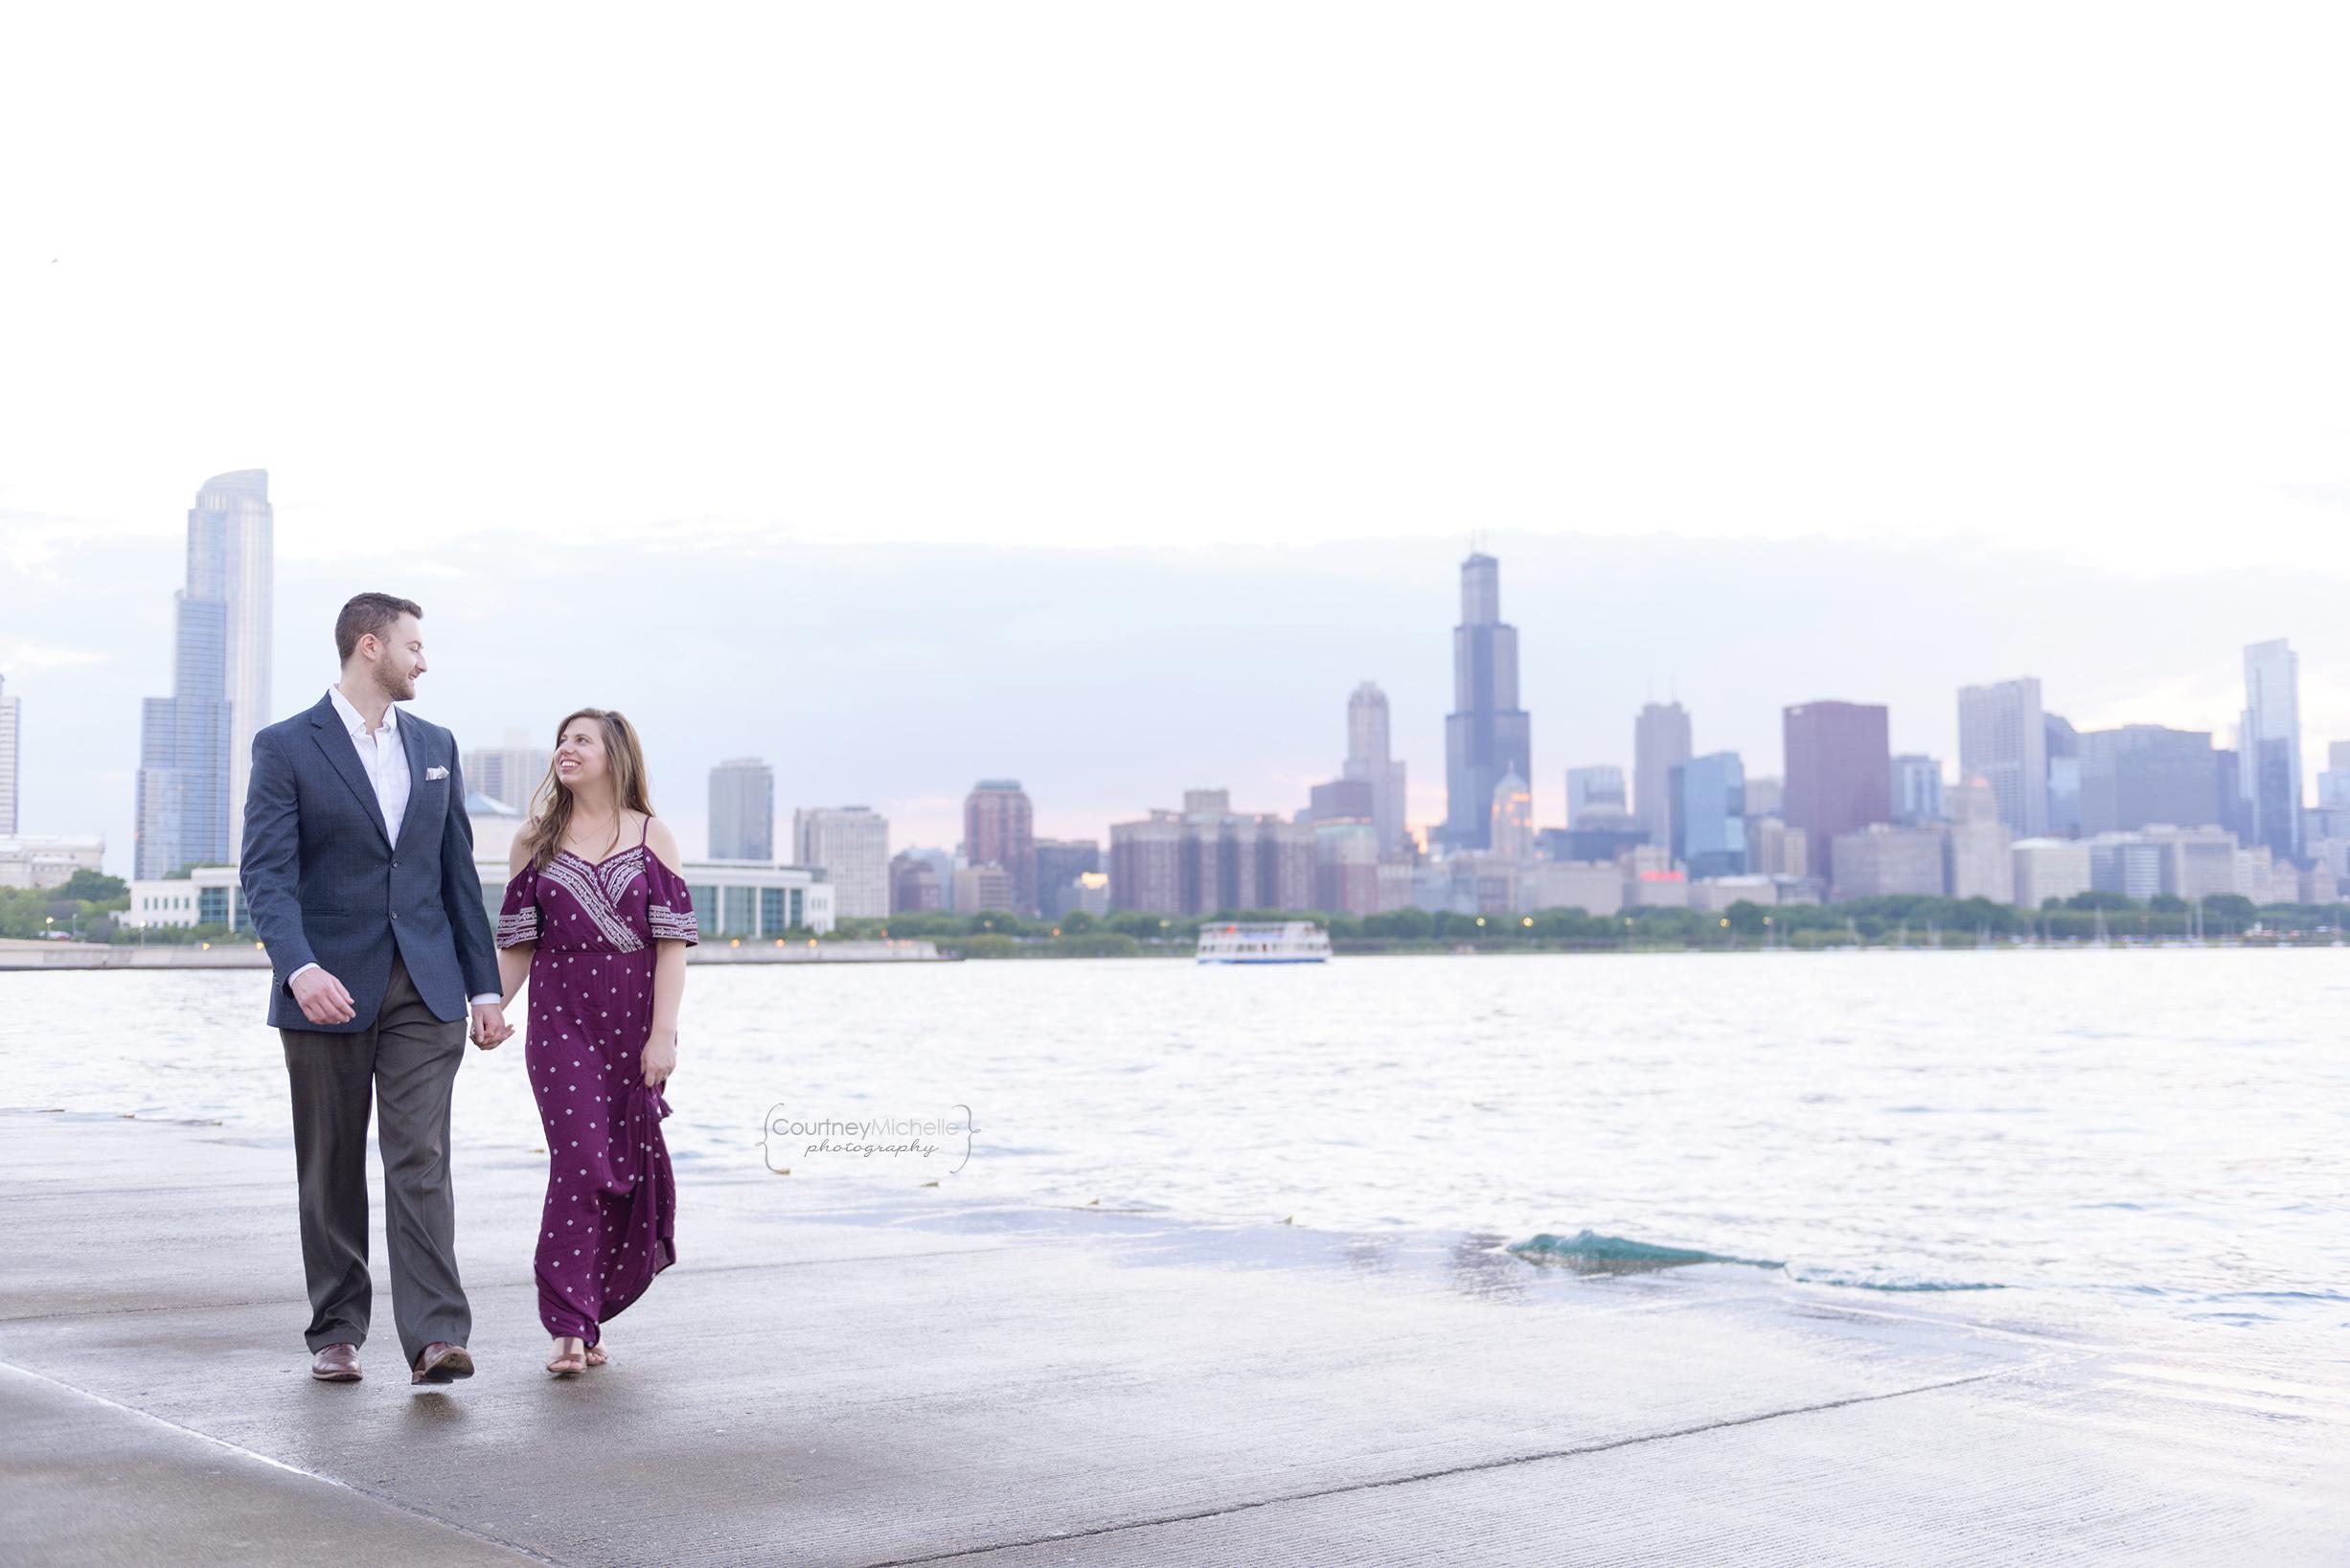 chicago-engagement-skyline-at-sunset-walking-adler-planetarium-engagement-photography-by-courtney-laper.jpg